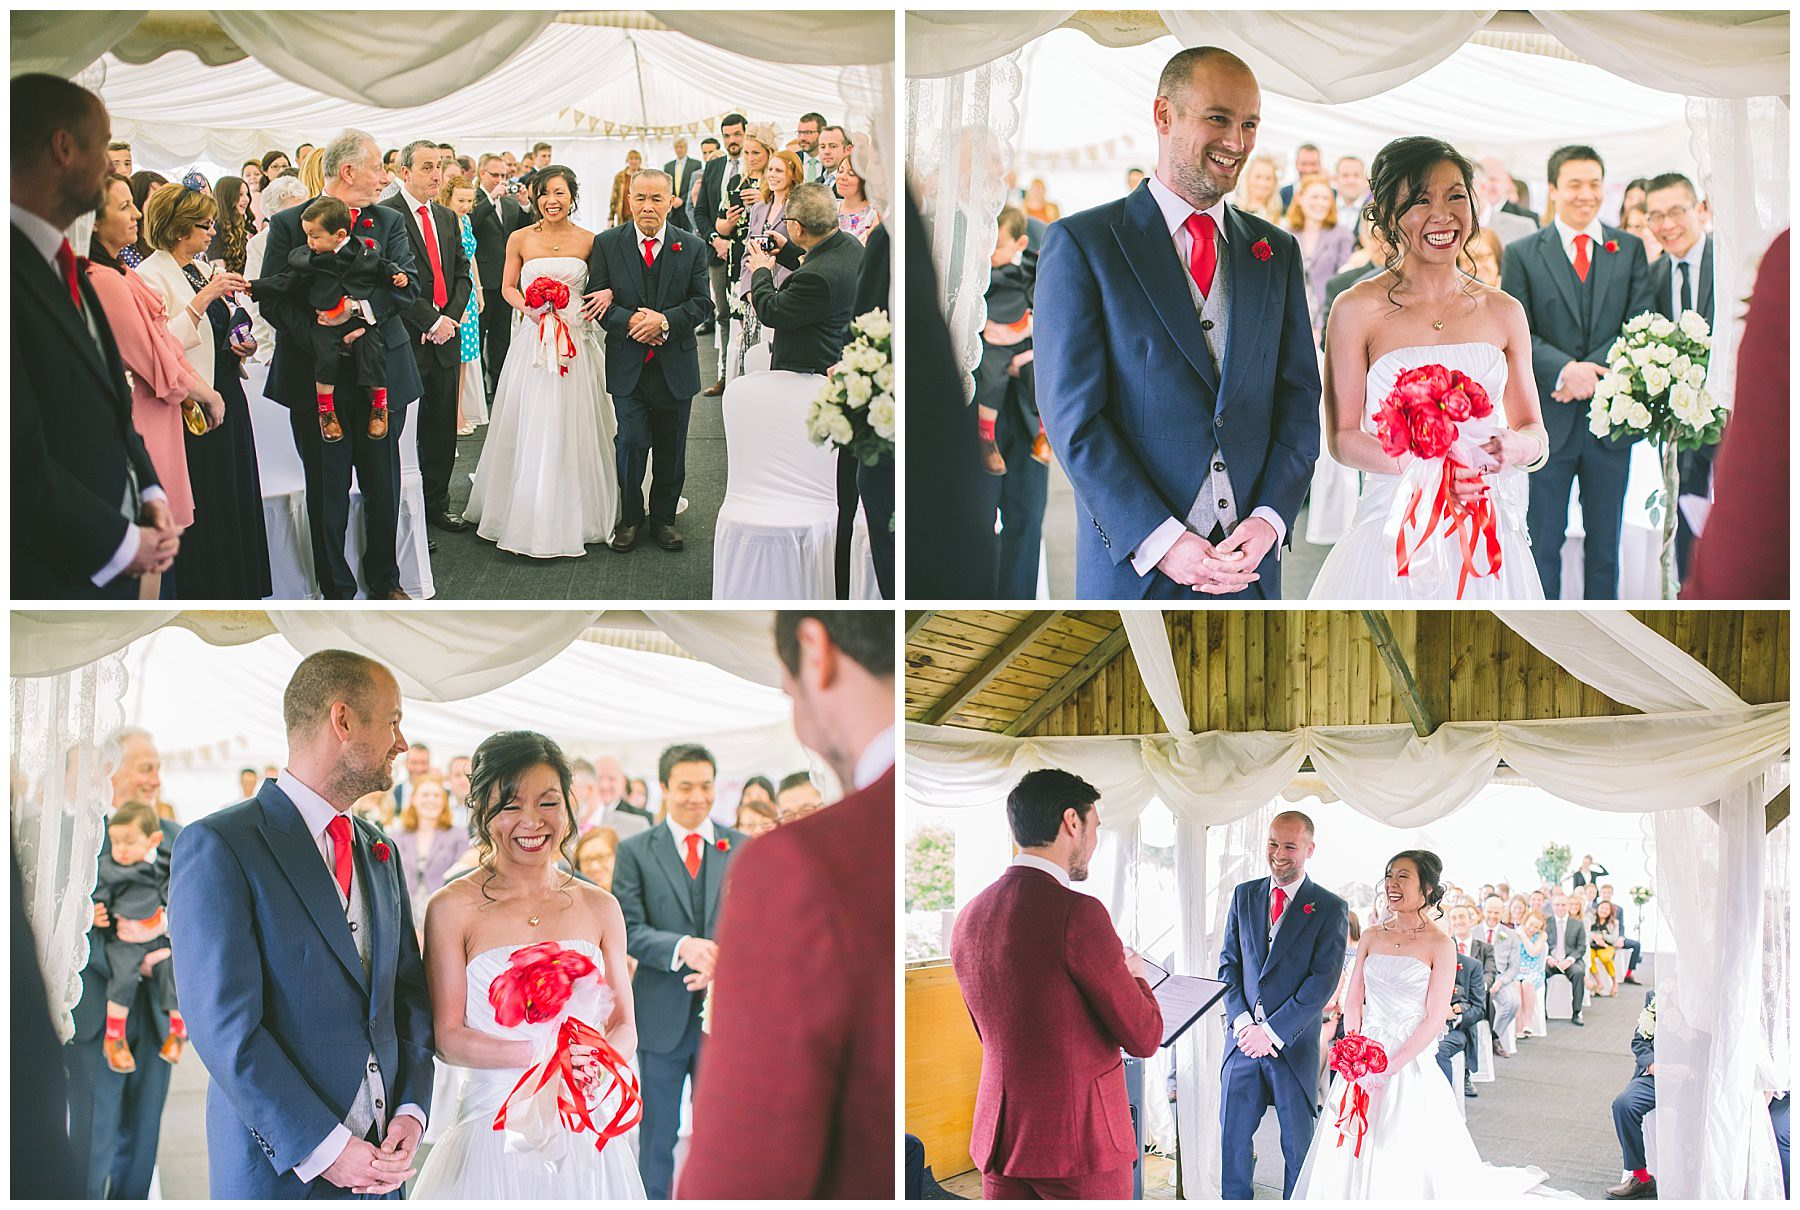 Bride arrives for the wedding ceremony at Pentre Mawr